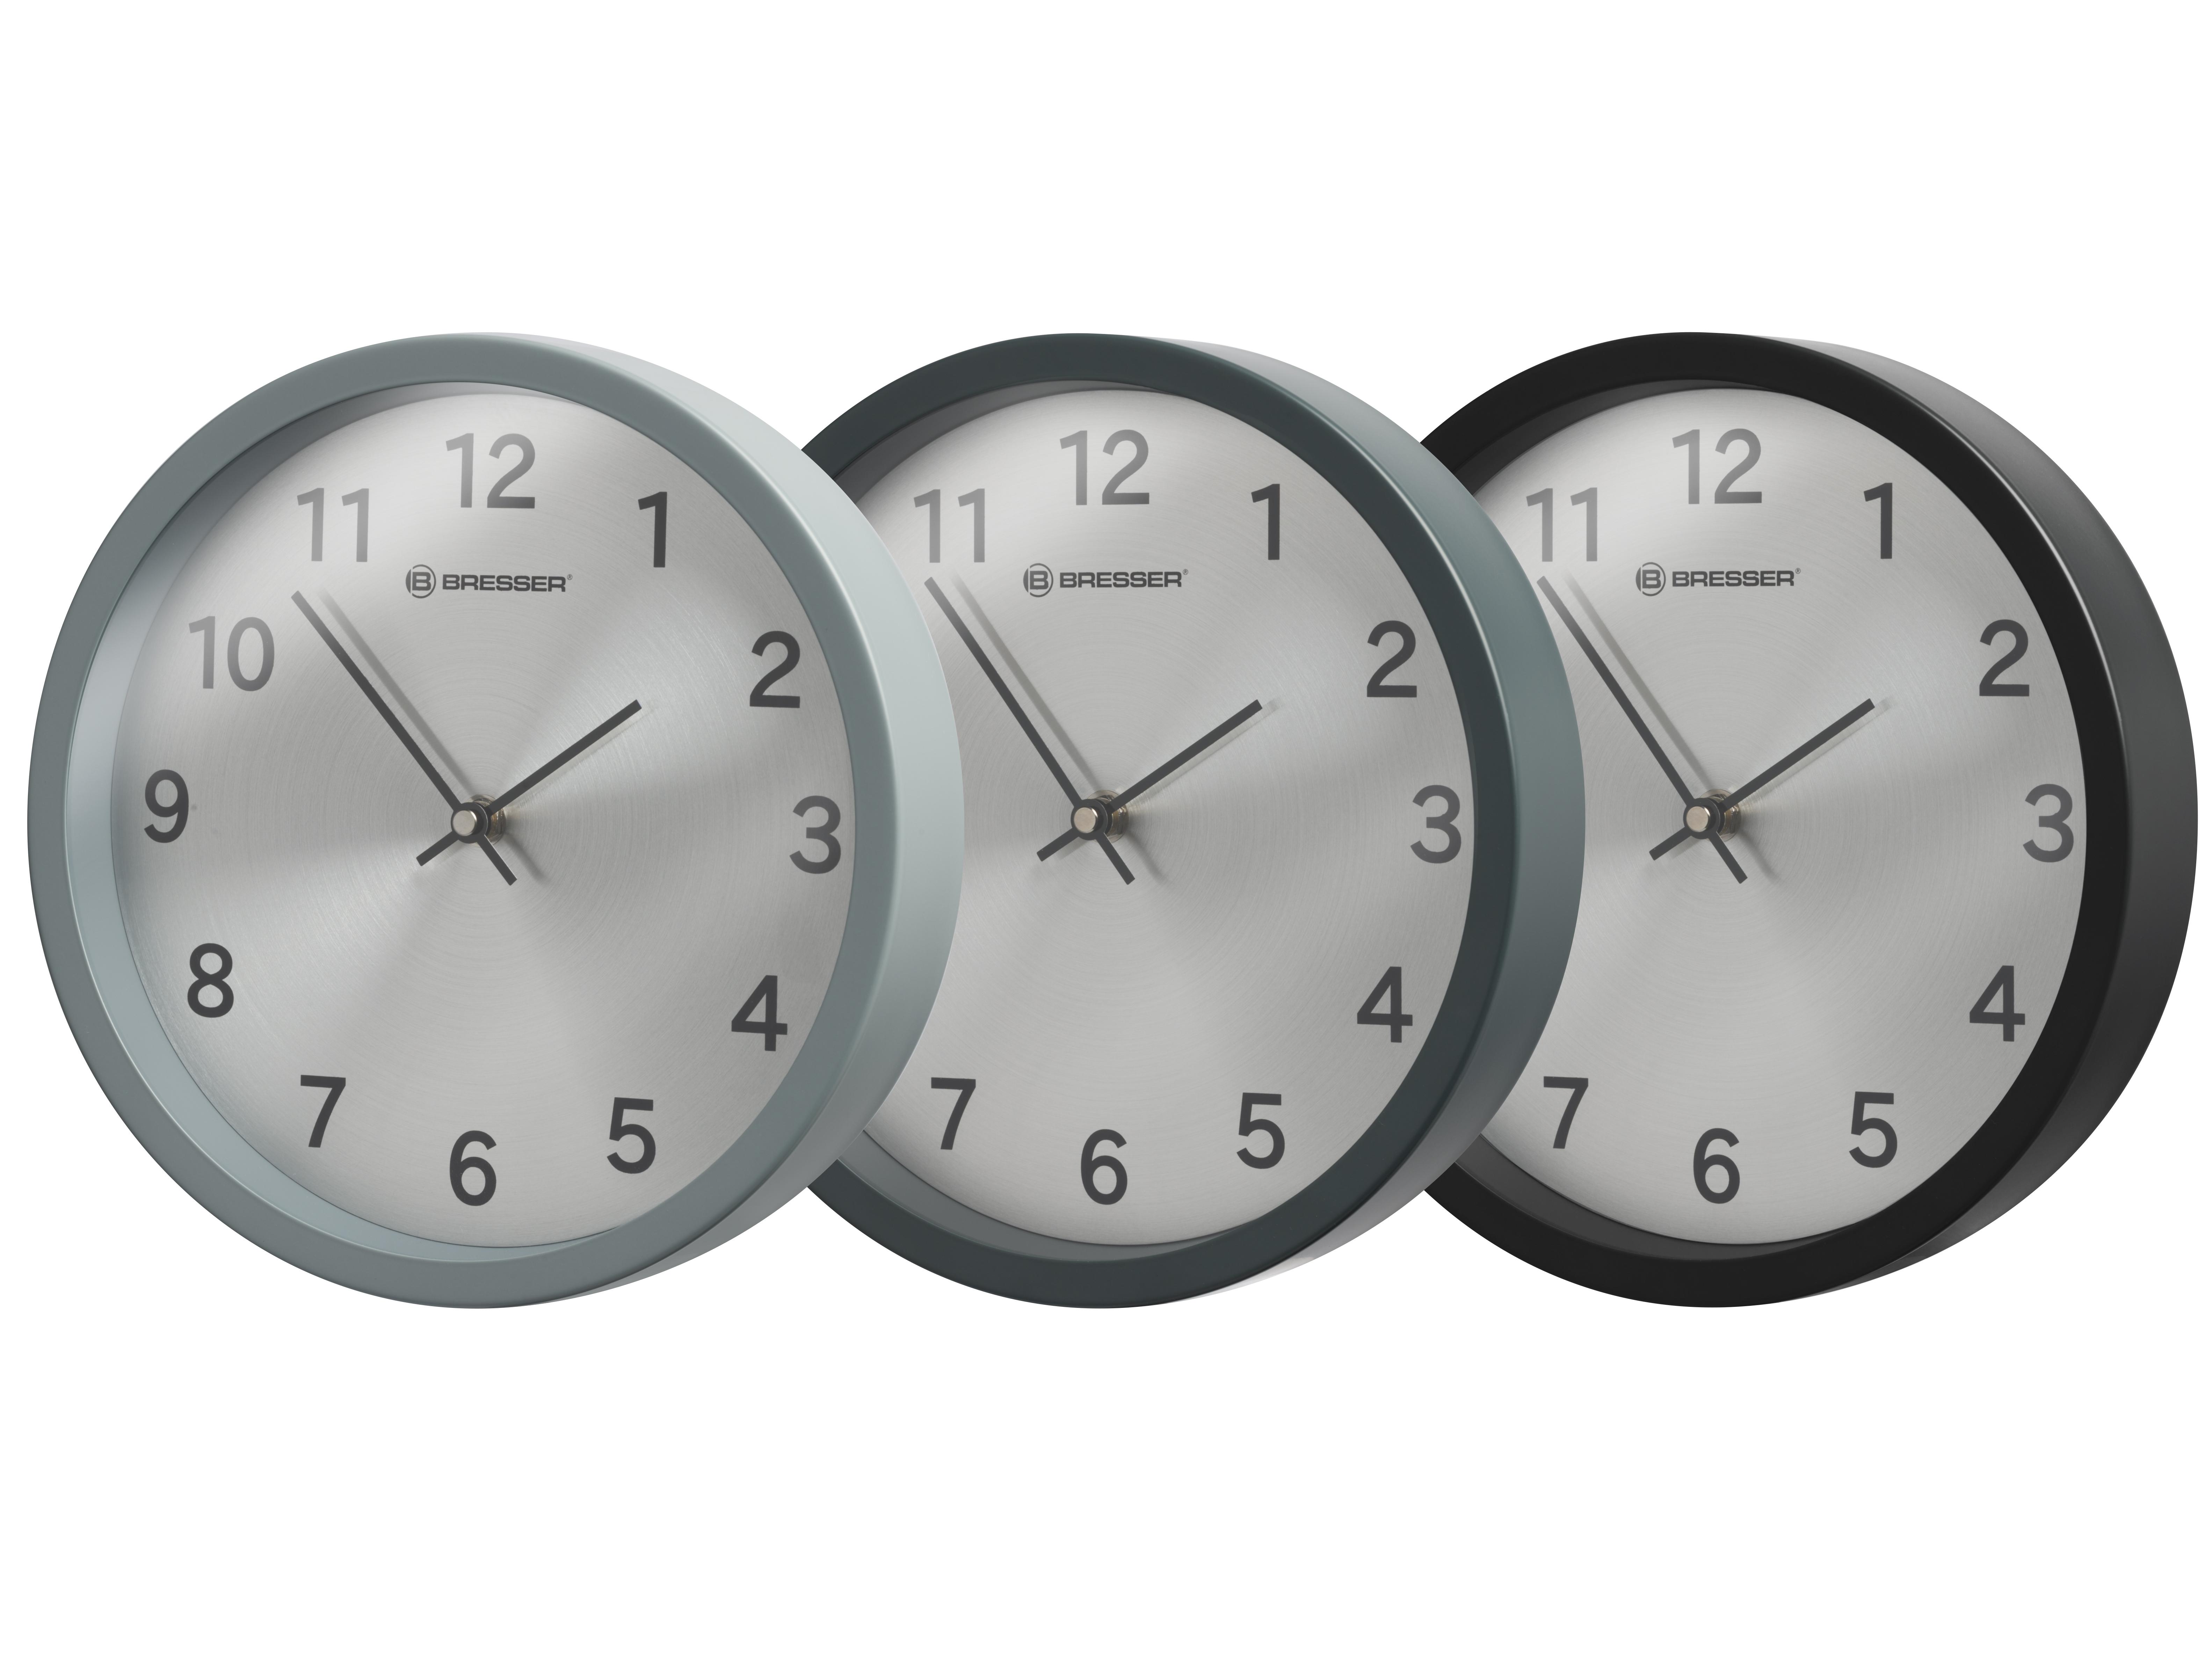 horloge murale bresser mytime silver edition acheter en ligne prix serr. Black Bedroom Furniture Sets. Home Design Ideas